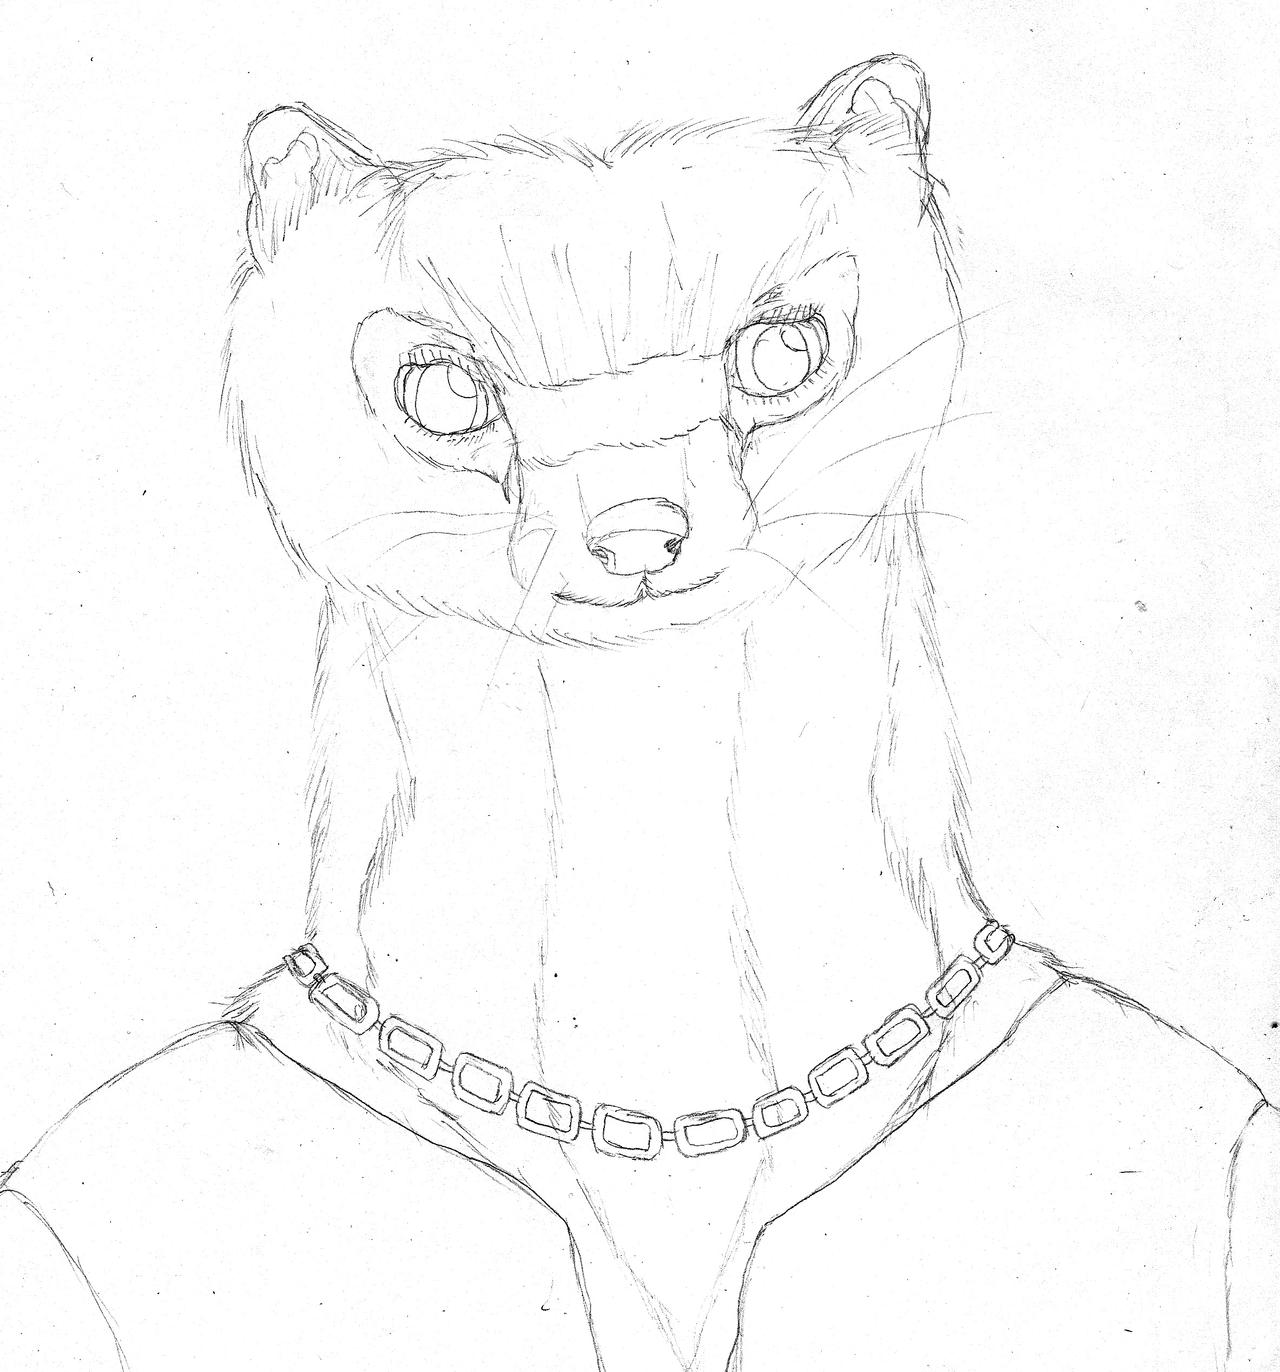 D Line Drawings Not Working : Teura work in progress line art by ascotia bluefleck on